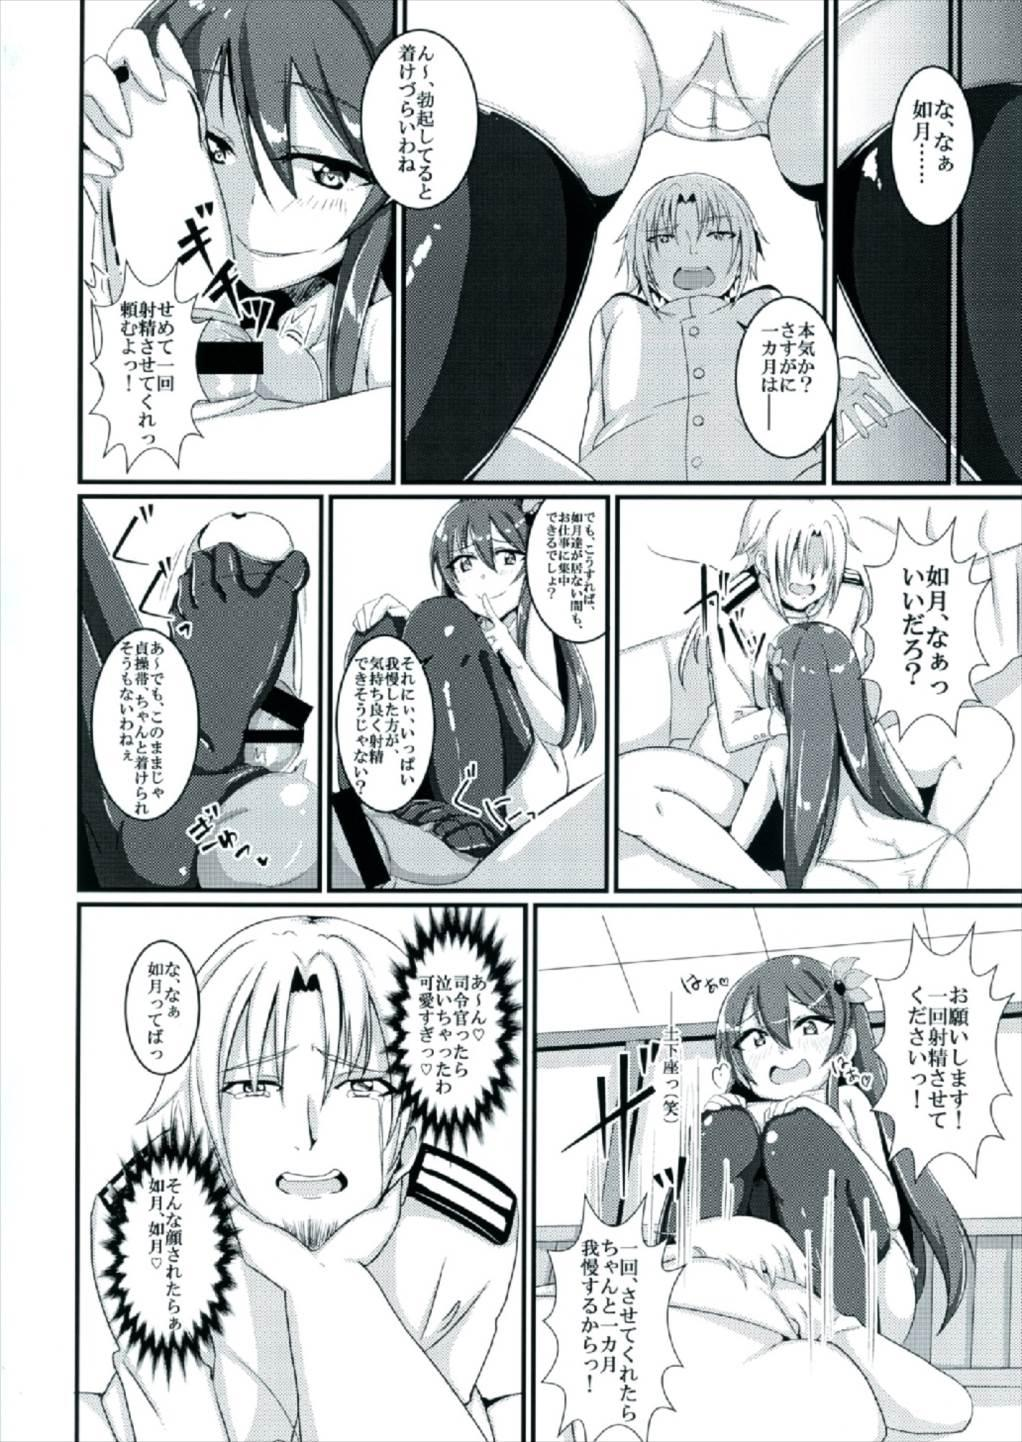 Mou Kisaragi Shika Aisenai! 5